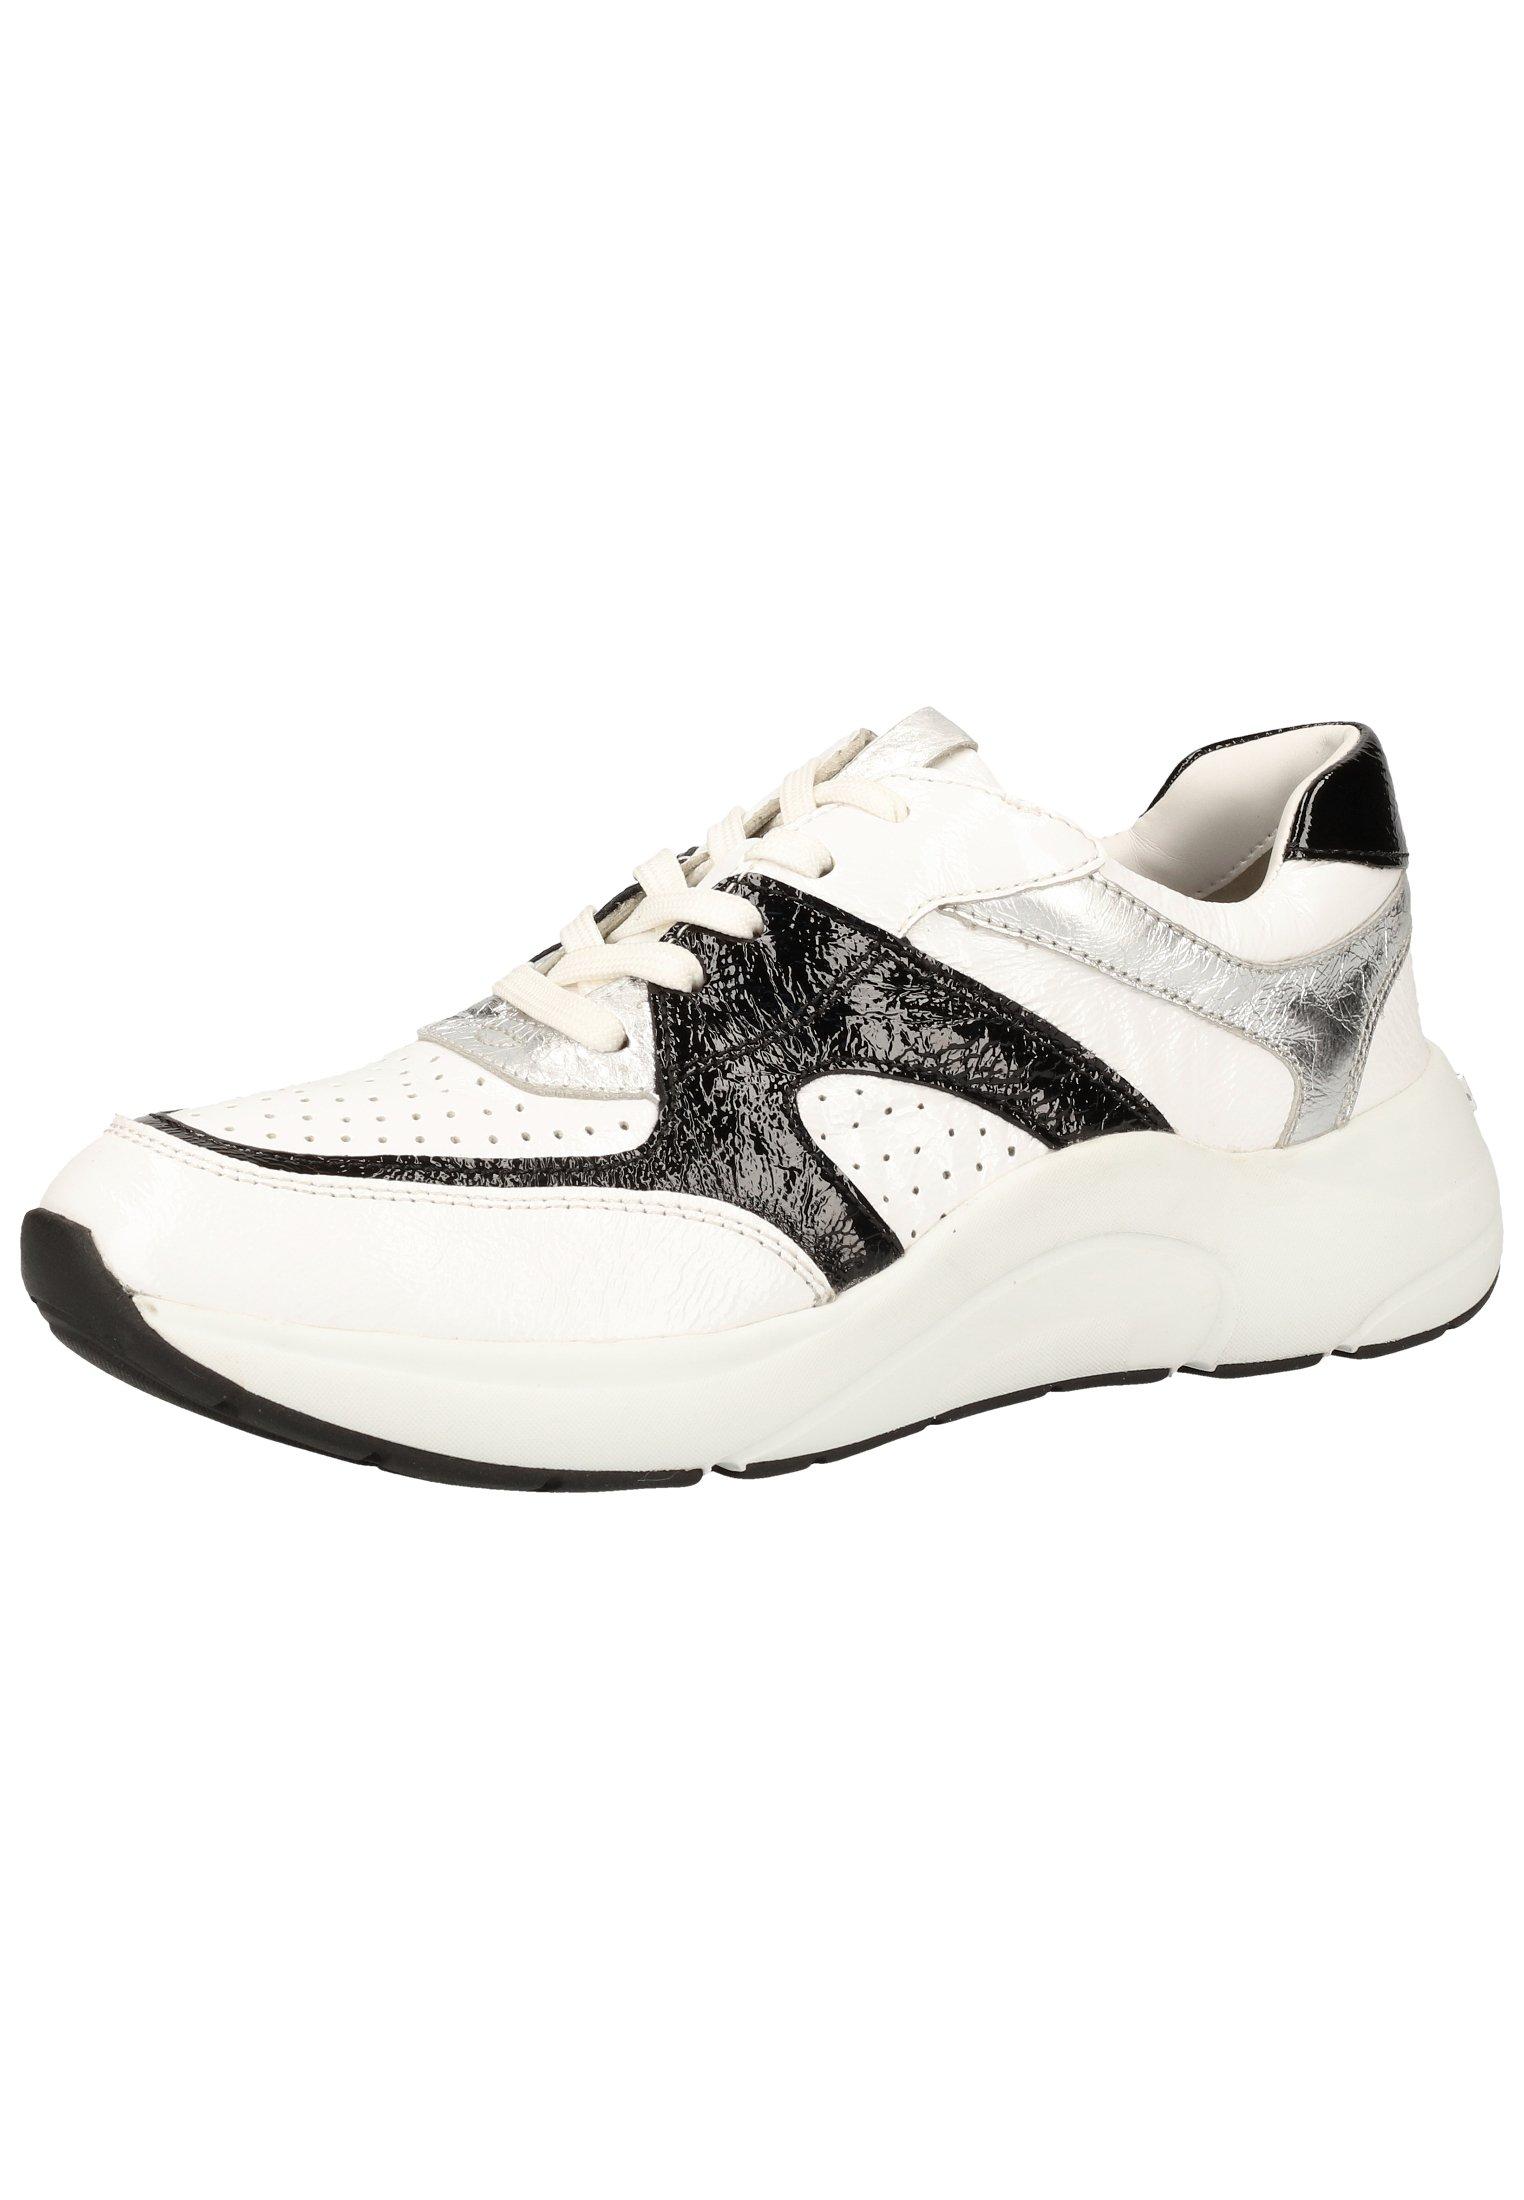 Caprice Sneakers - white/black